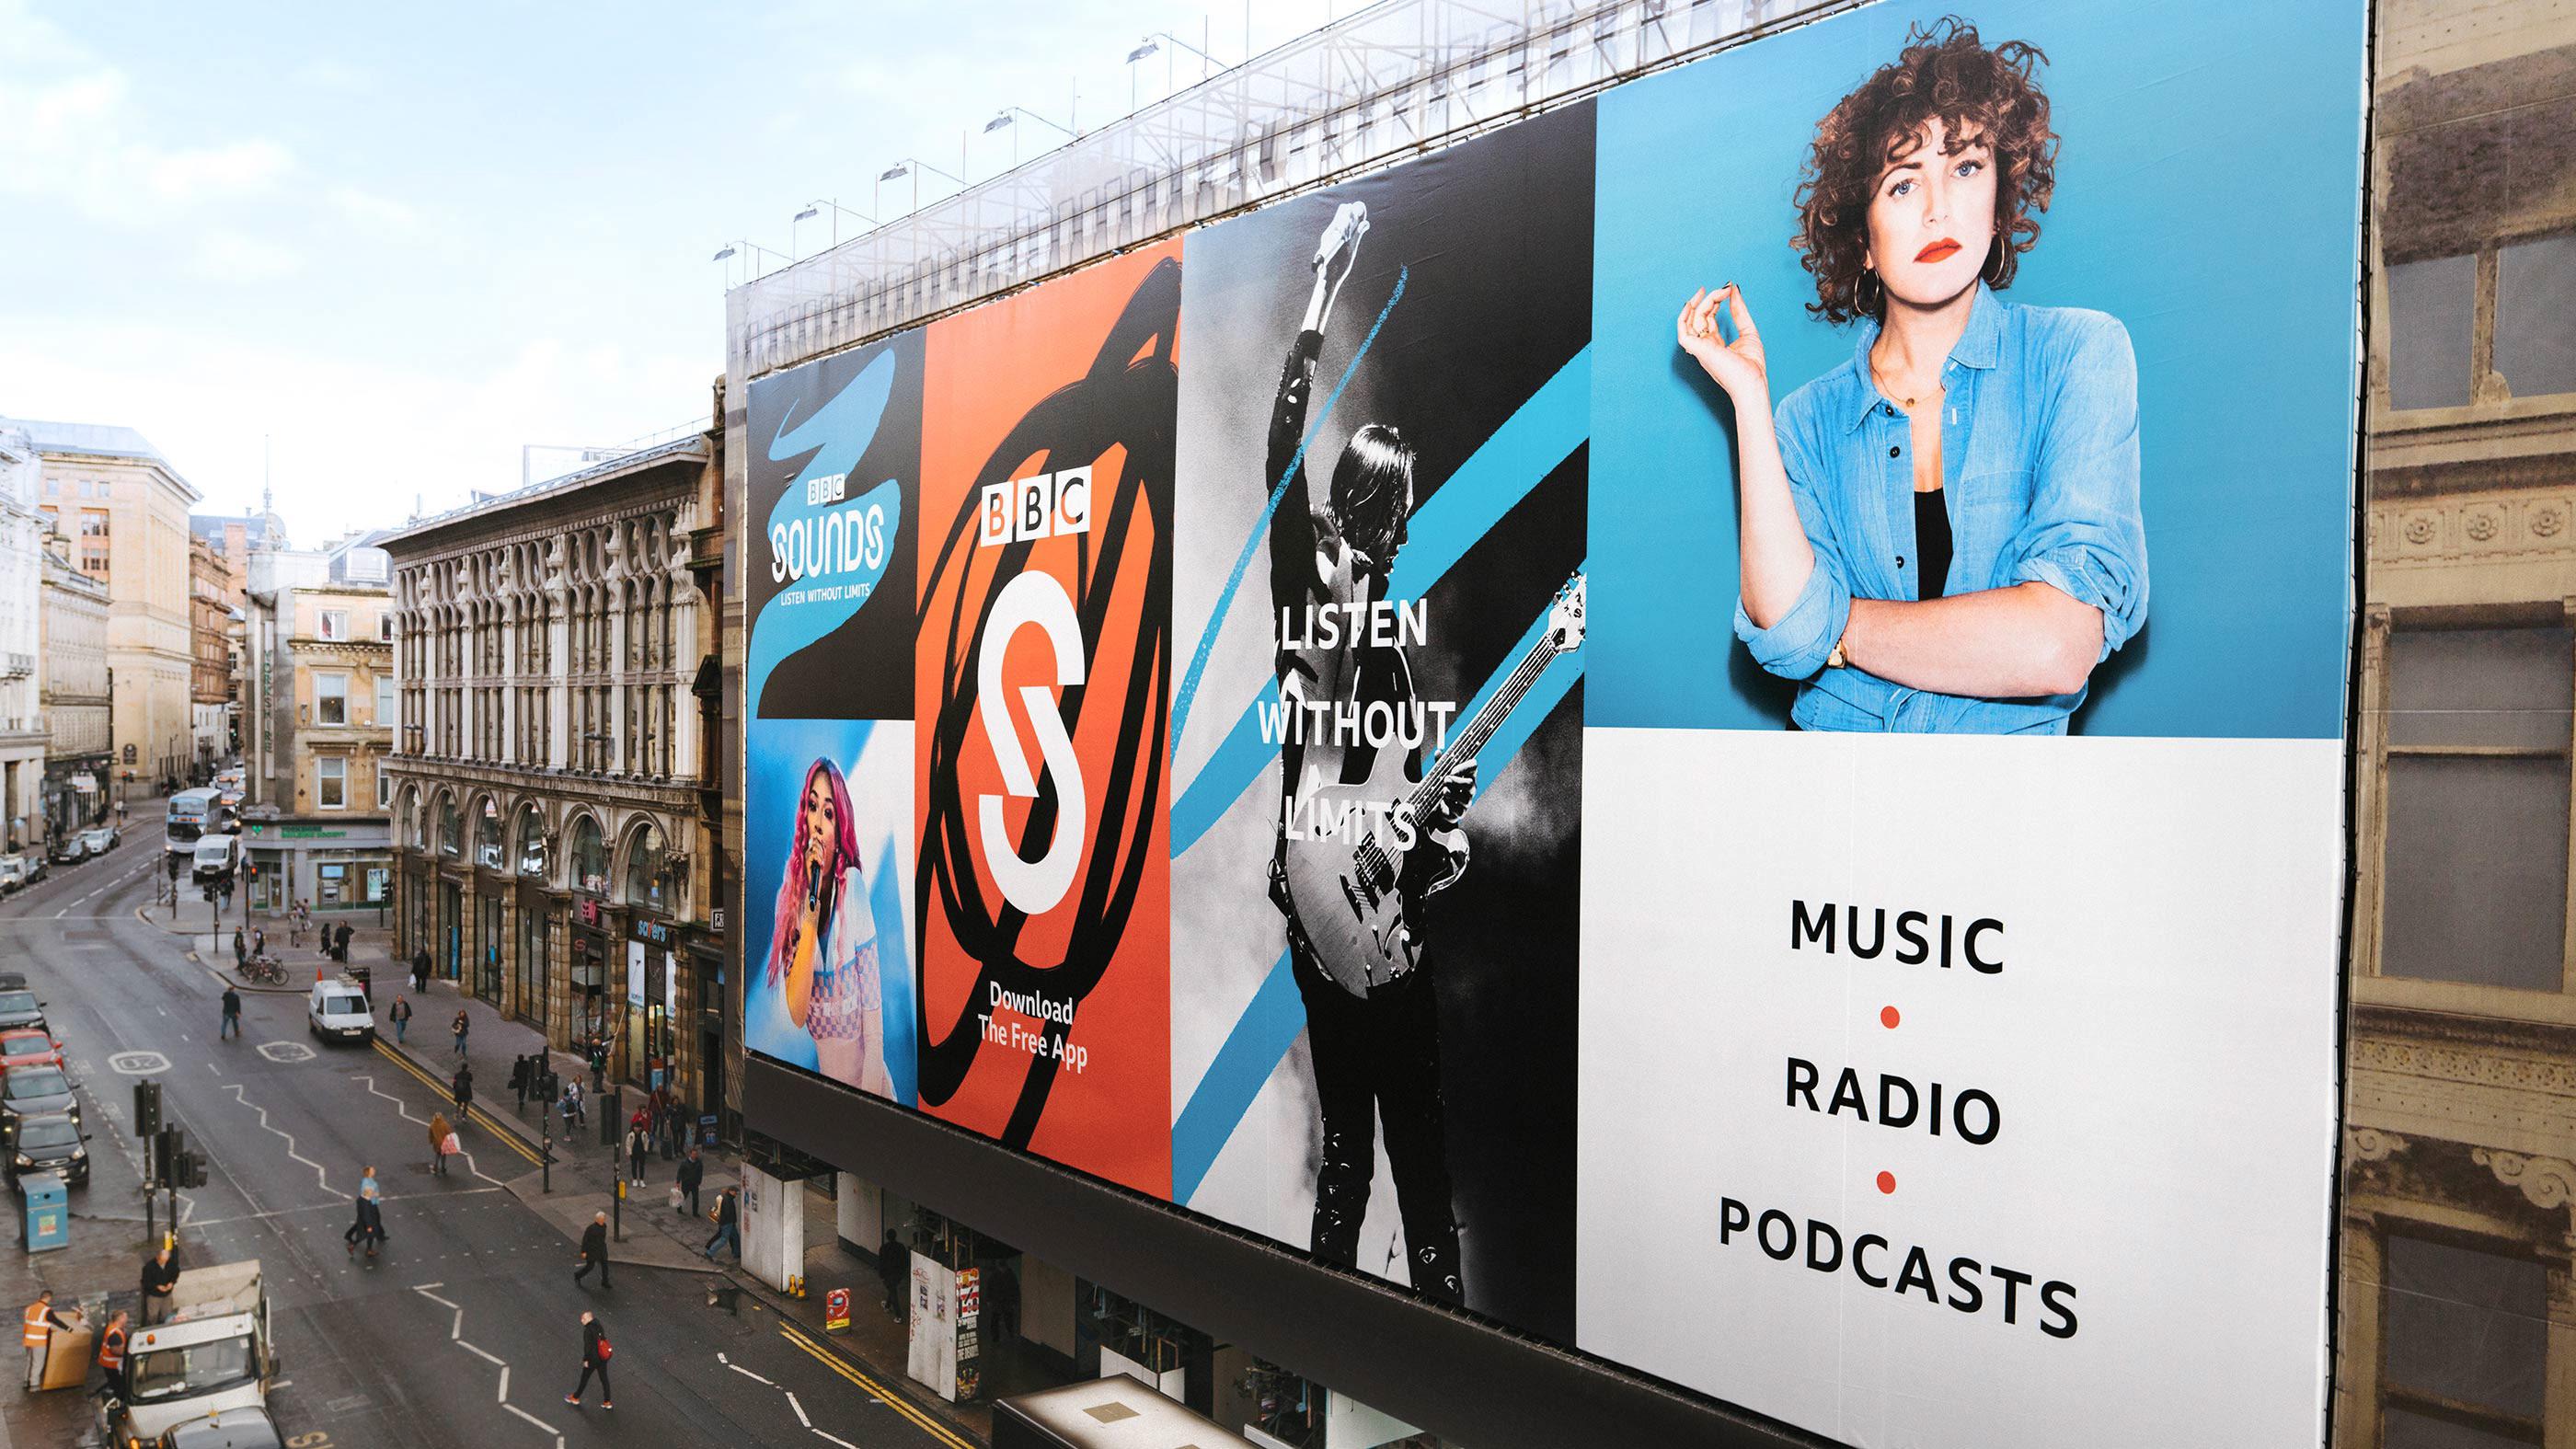 BBC Sounds on Behance